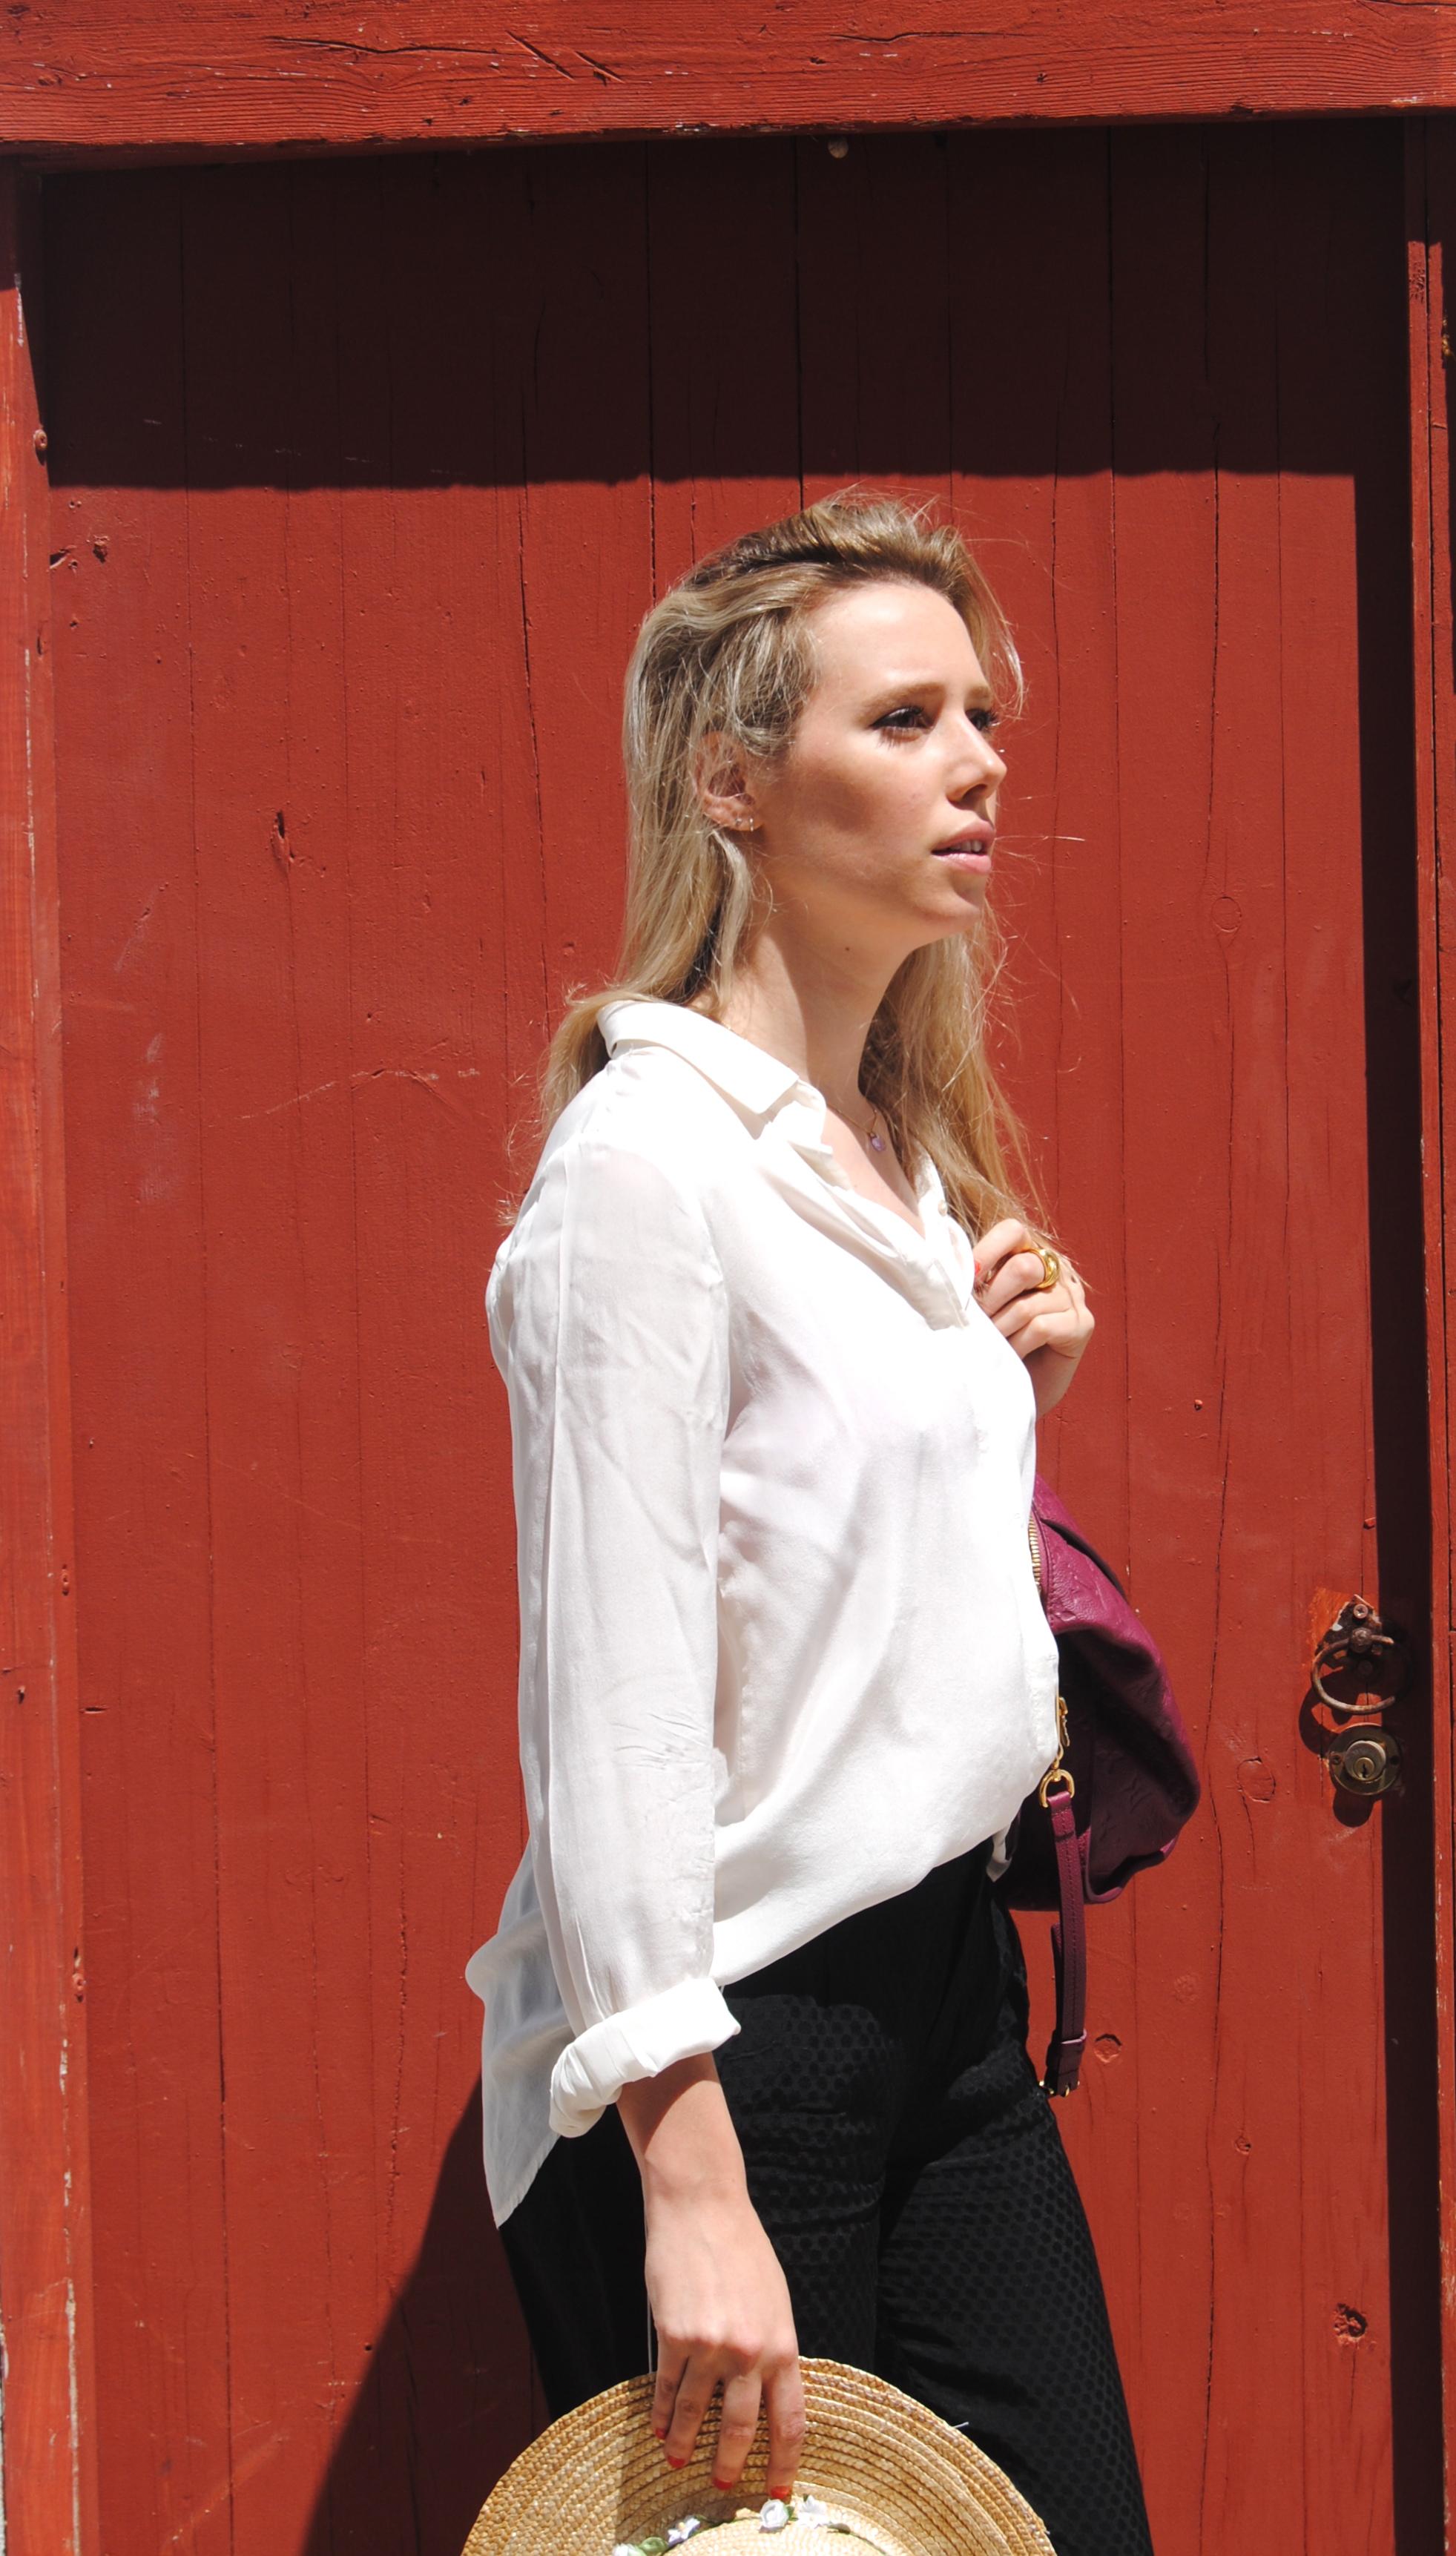 Camisa, pantalones y sandalias: Zara; Bolso: Louis Vuitton; Sombrero: ASOS